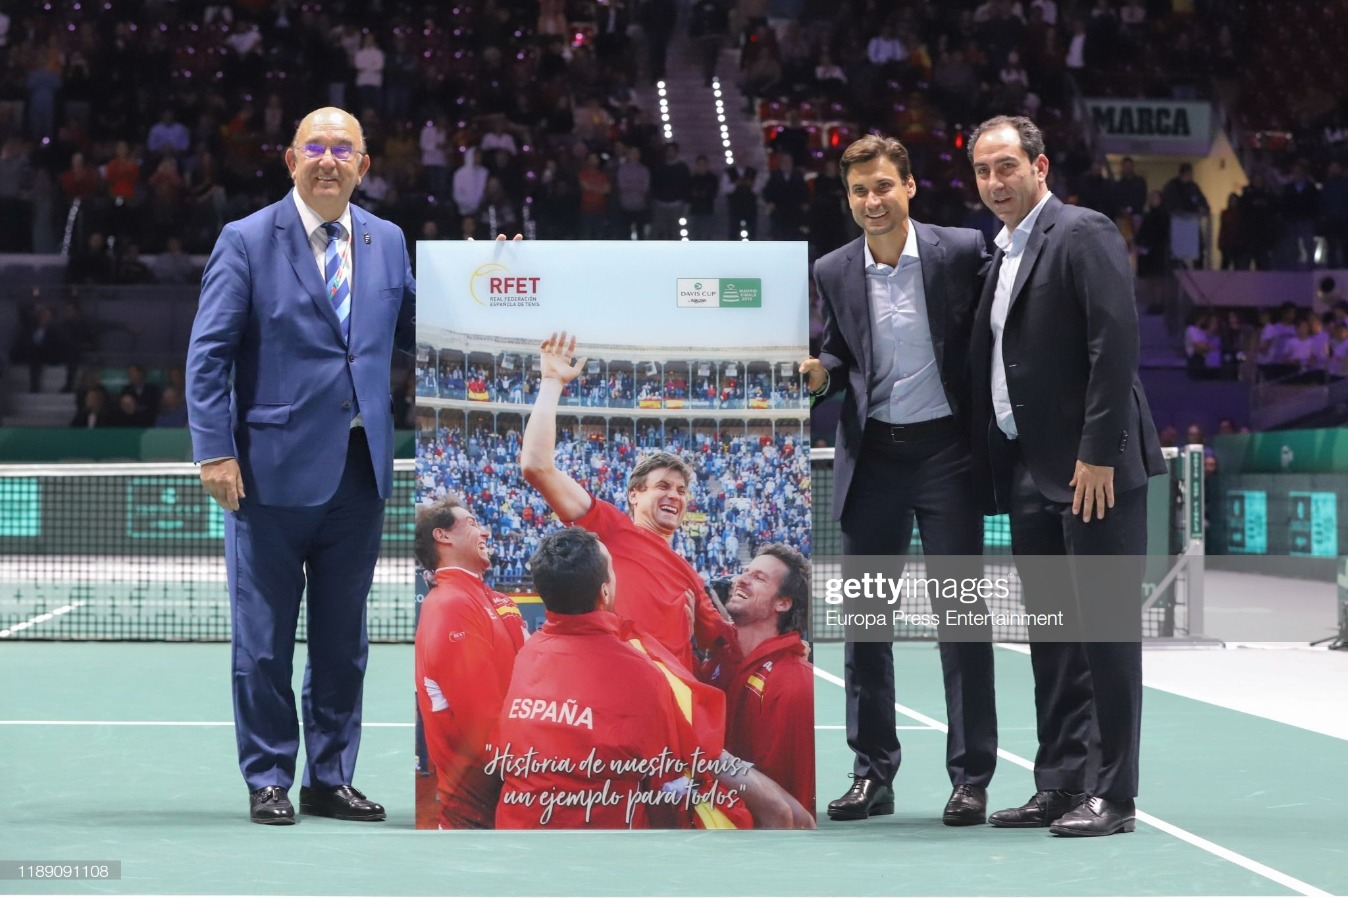 Day 7 - Celebrities Attend Copa Davis Finals in Madrid : News Photo